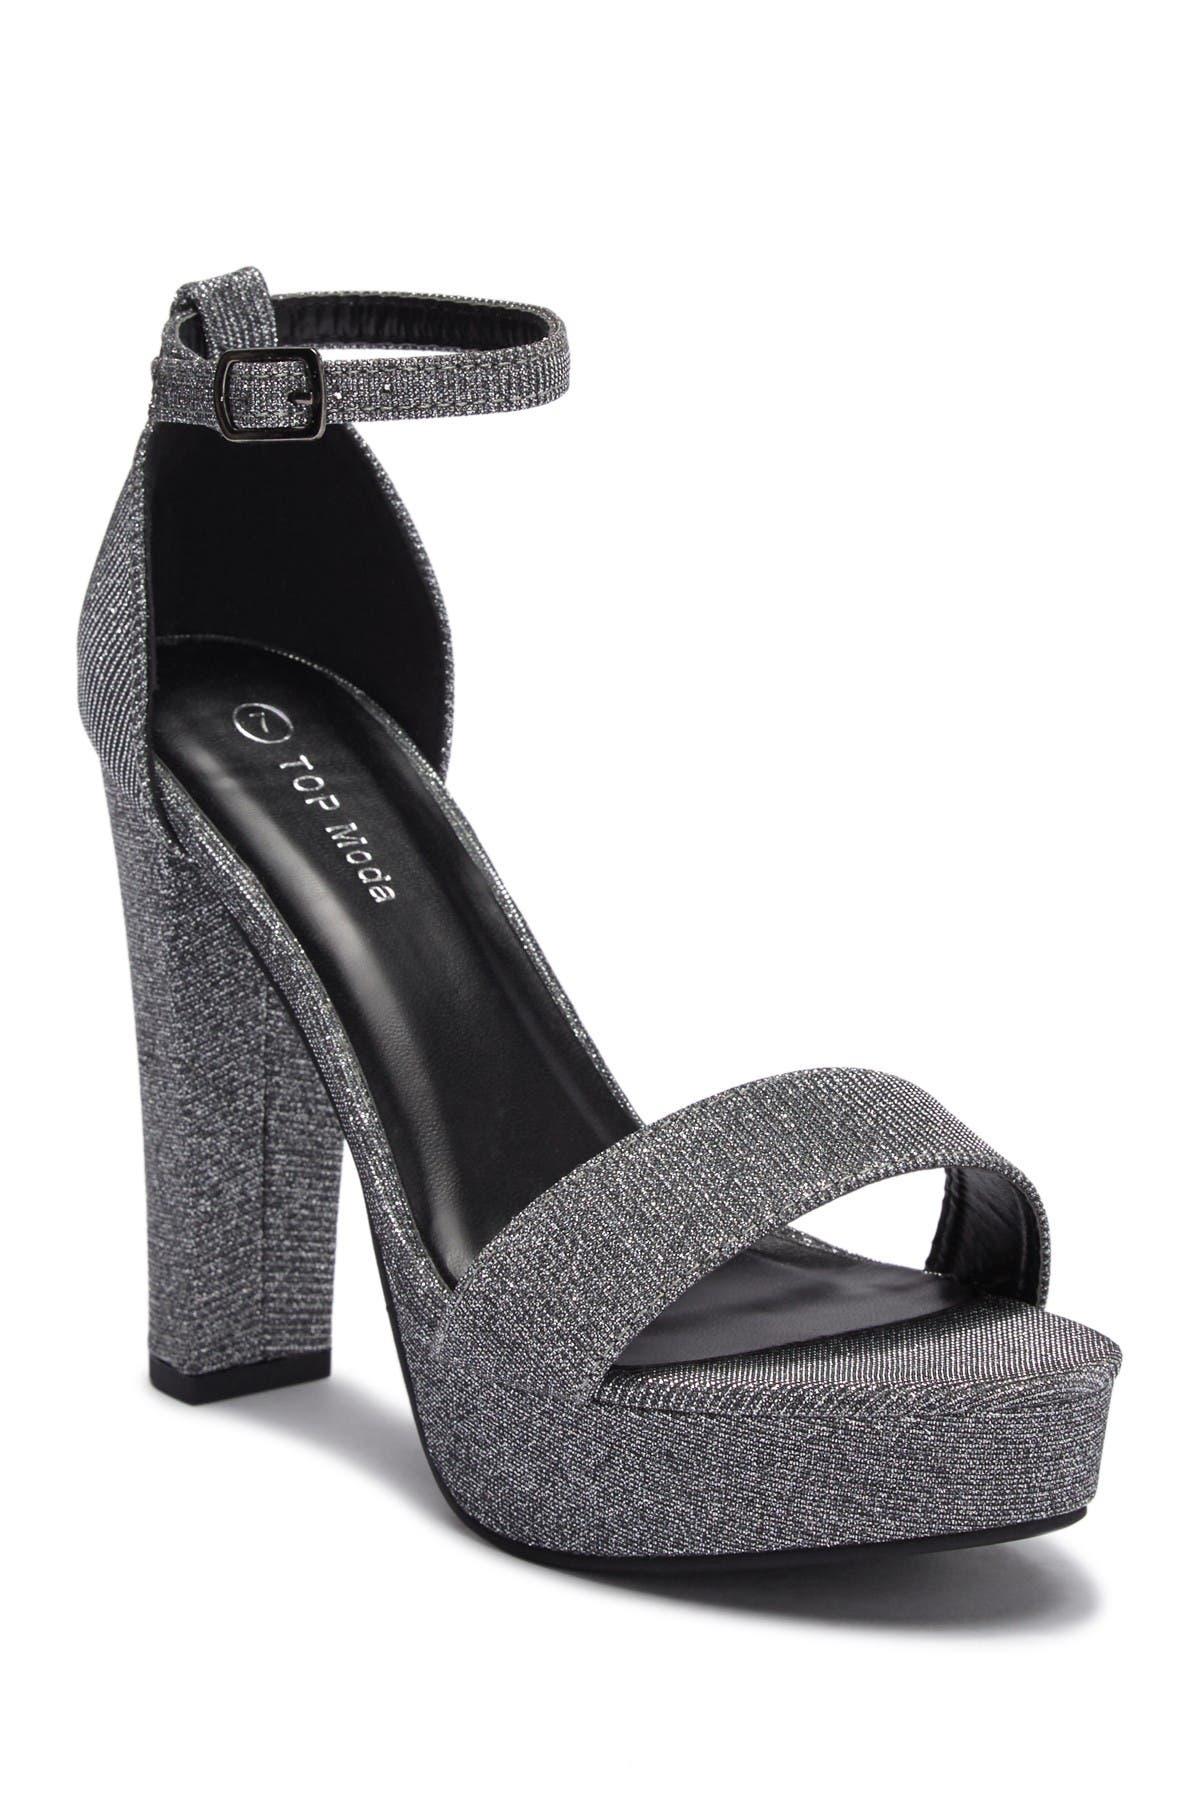 Image of Top Moda Thomas Platform Ankle Strap Sandal